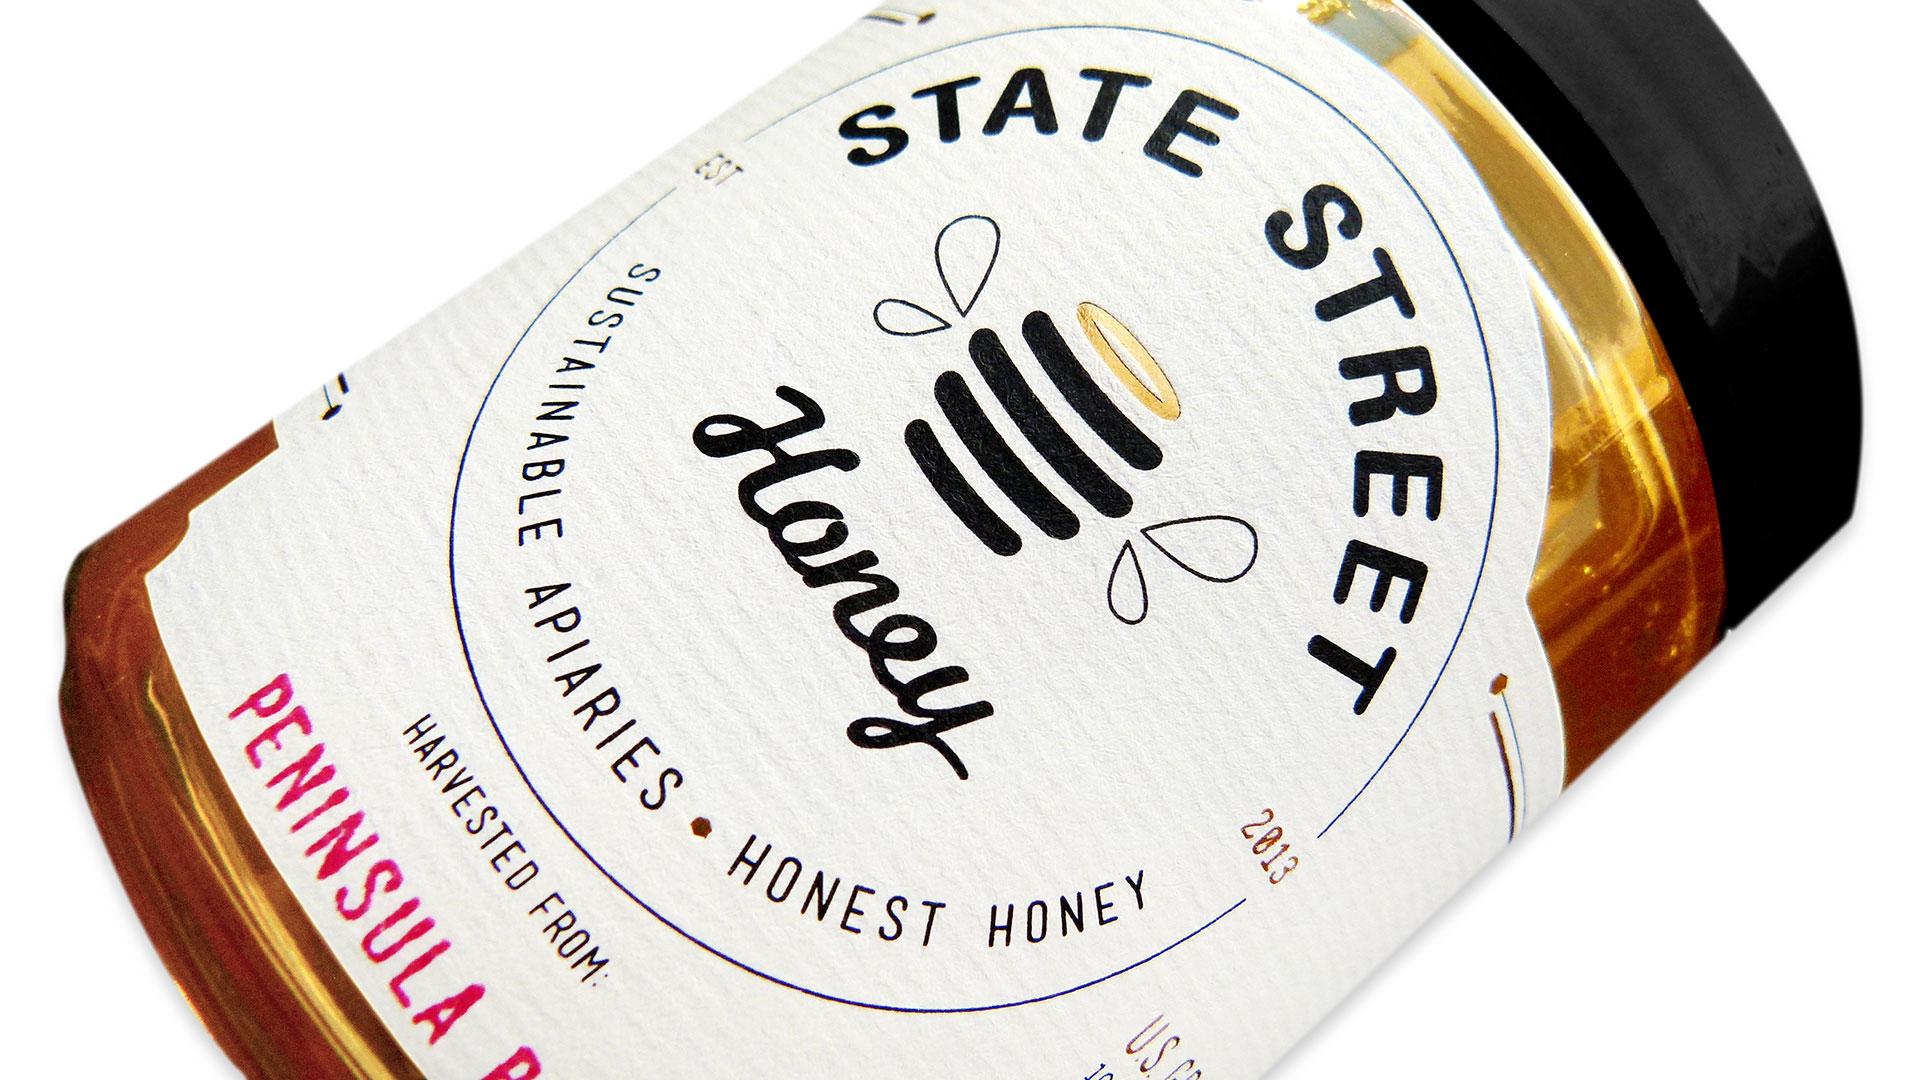 770-state-st-honey-1